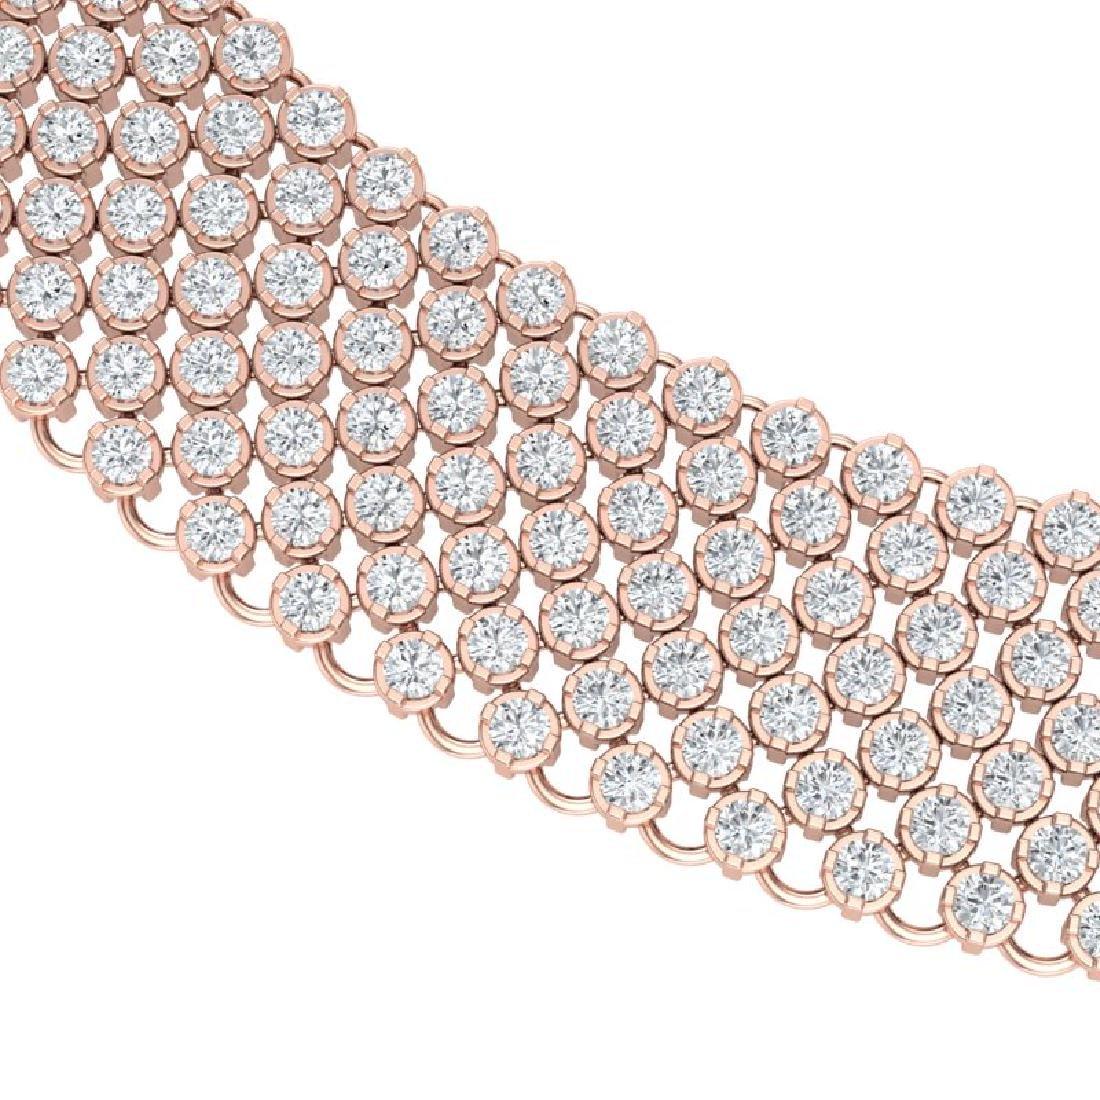 35 CTW Certified VS/SI Diamond Necklace 18K Rose Gold - 2